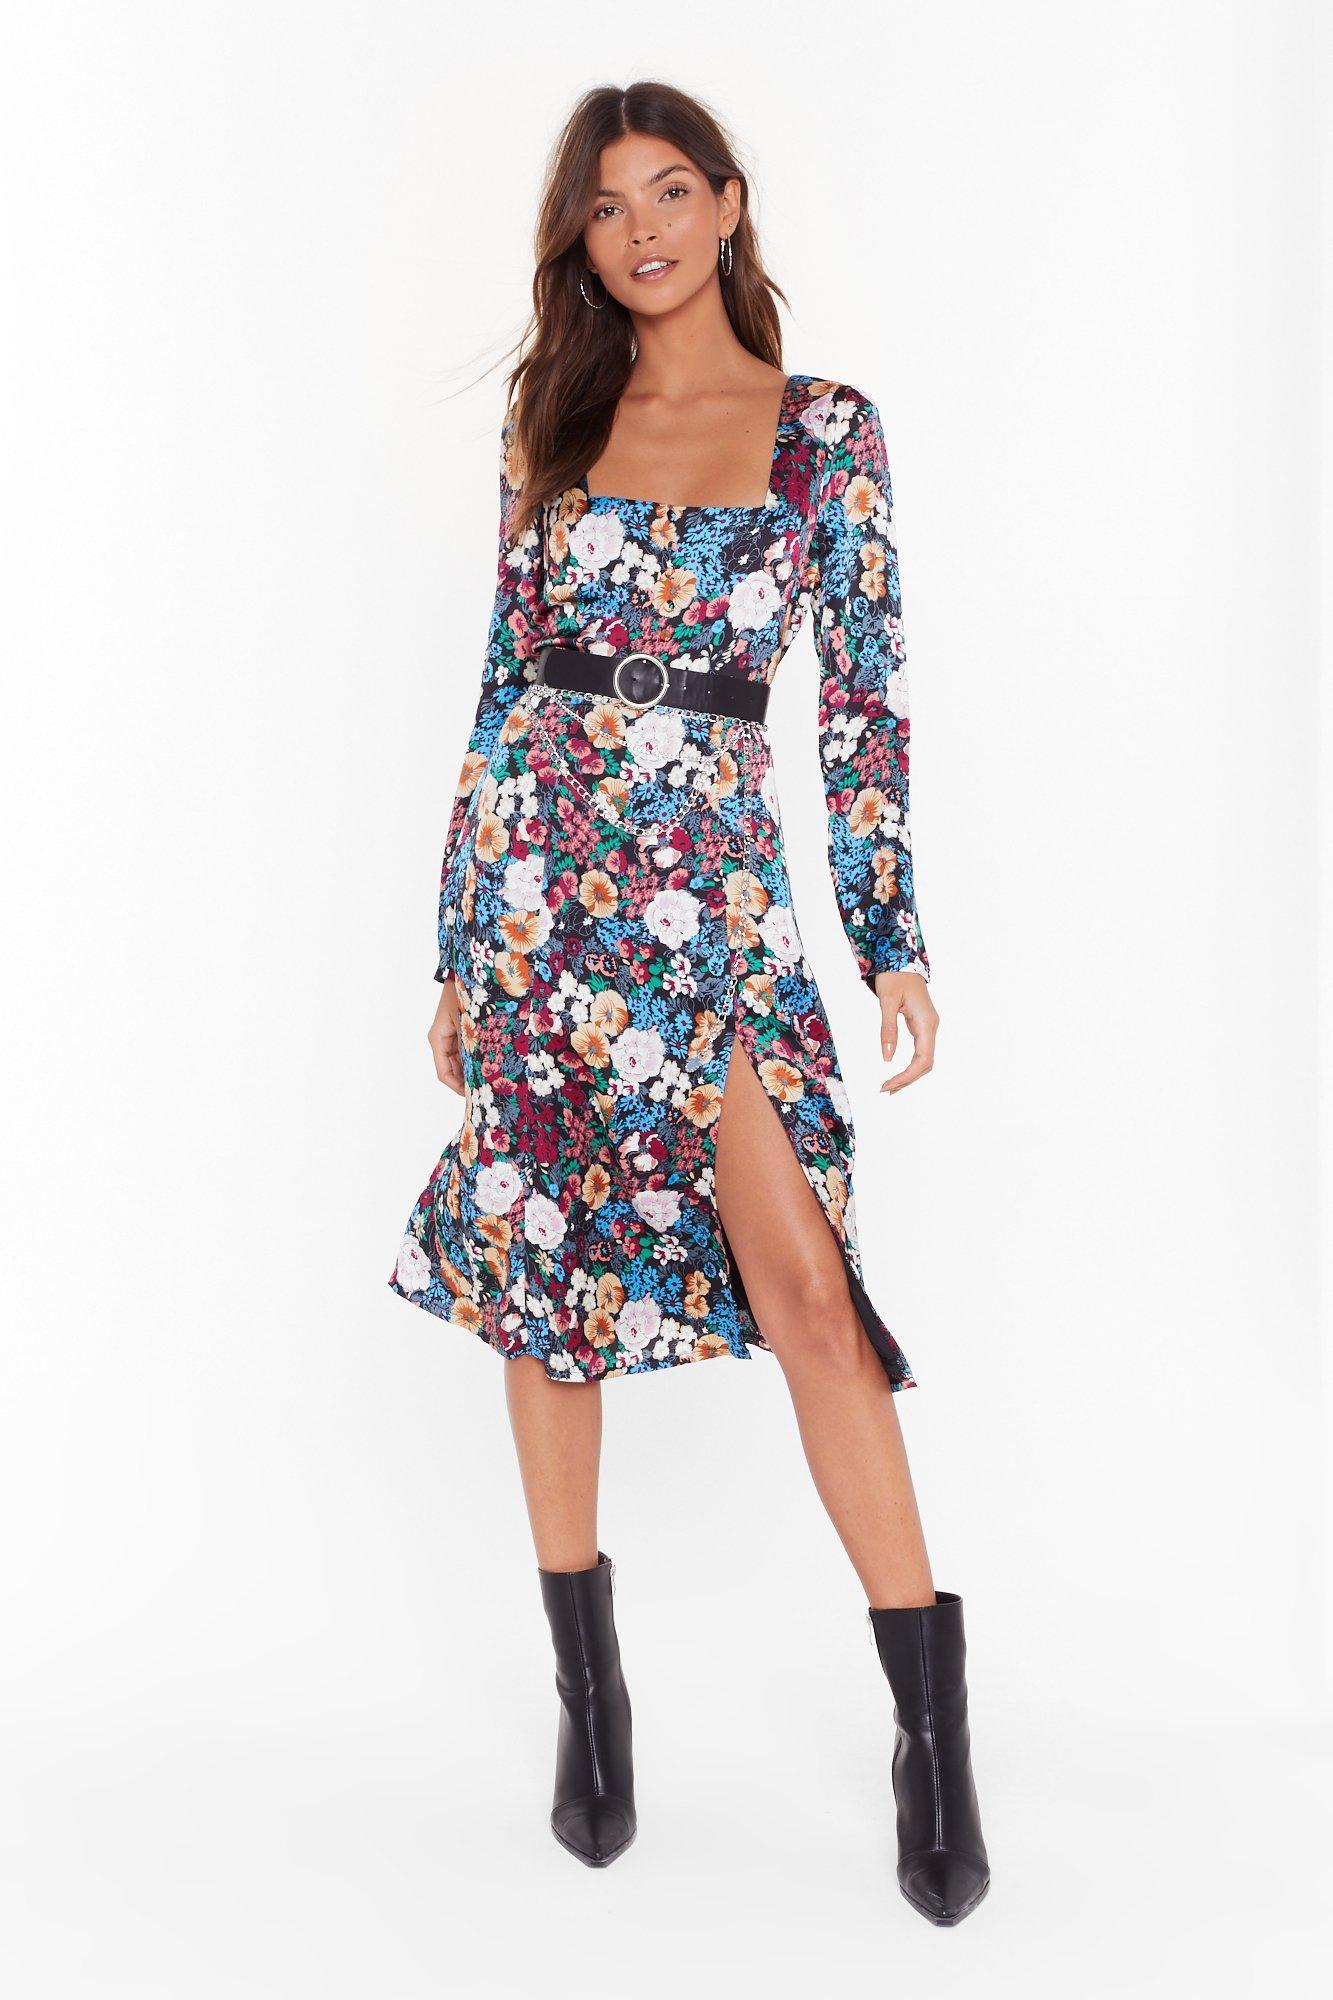 Image of Best Buds Floral Midi Dress